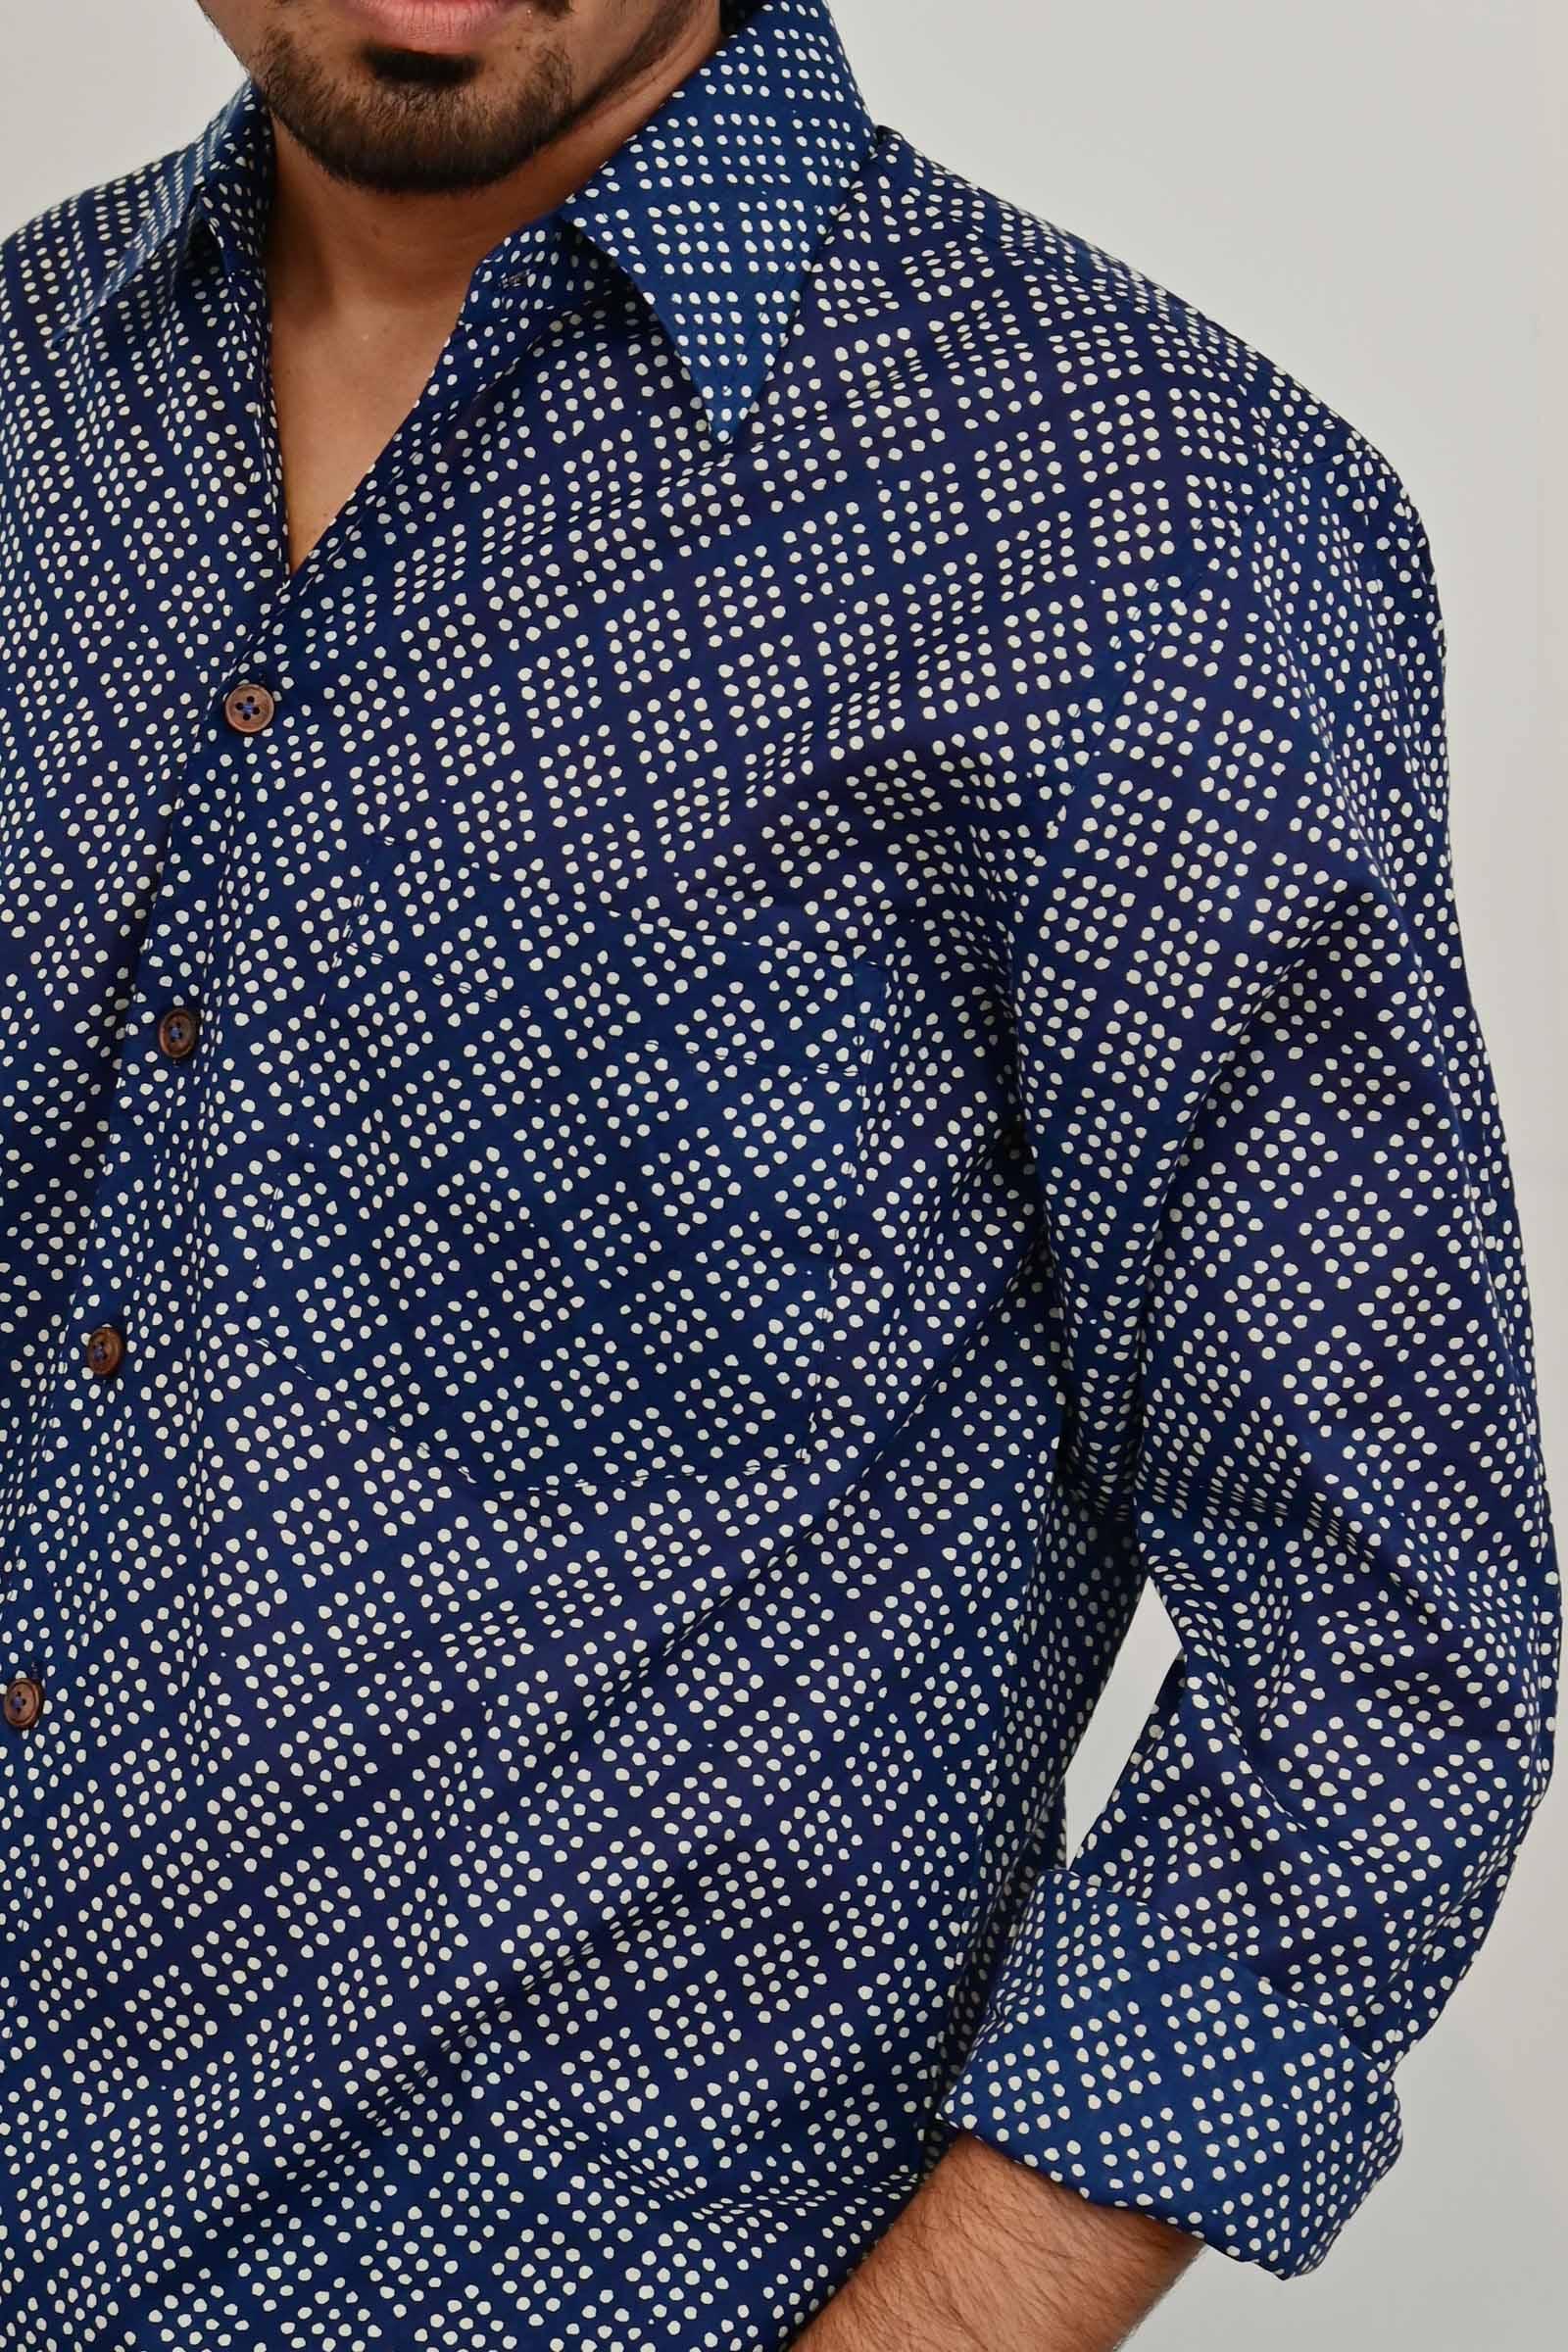 Spot Diamond Blue Shirt F/S